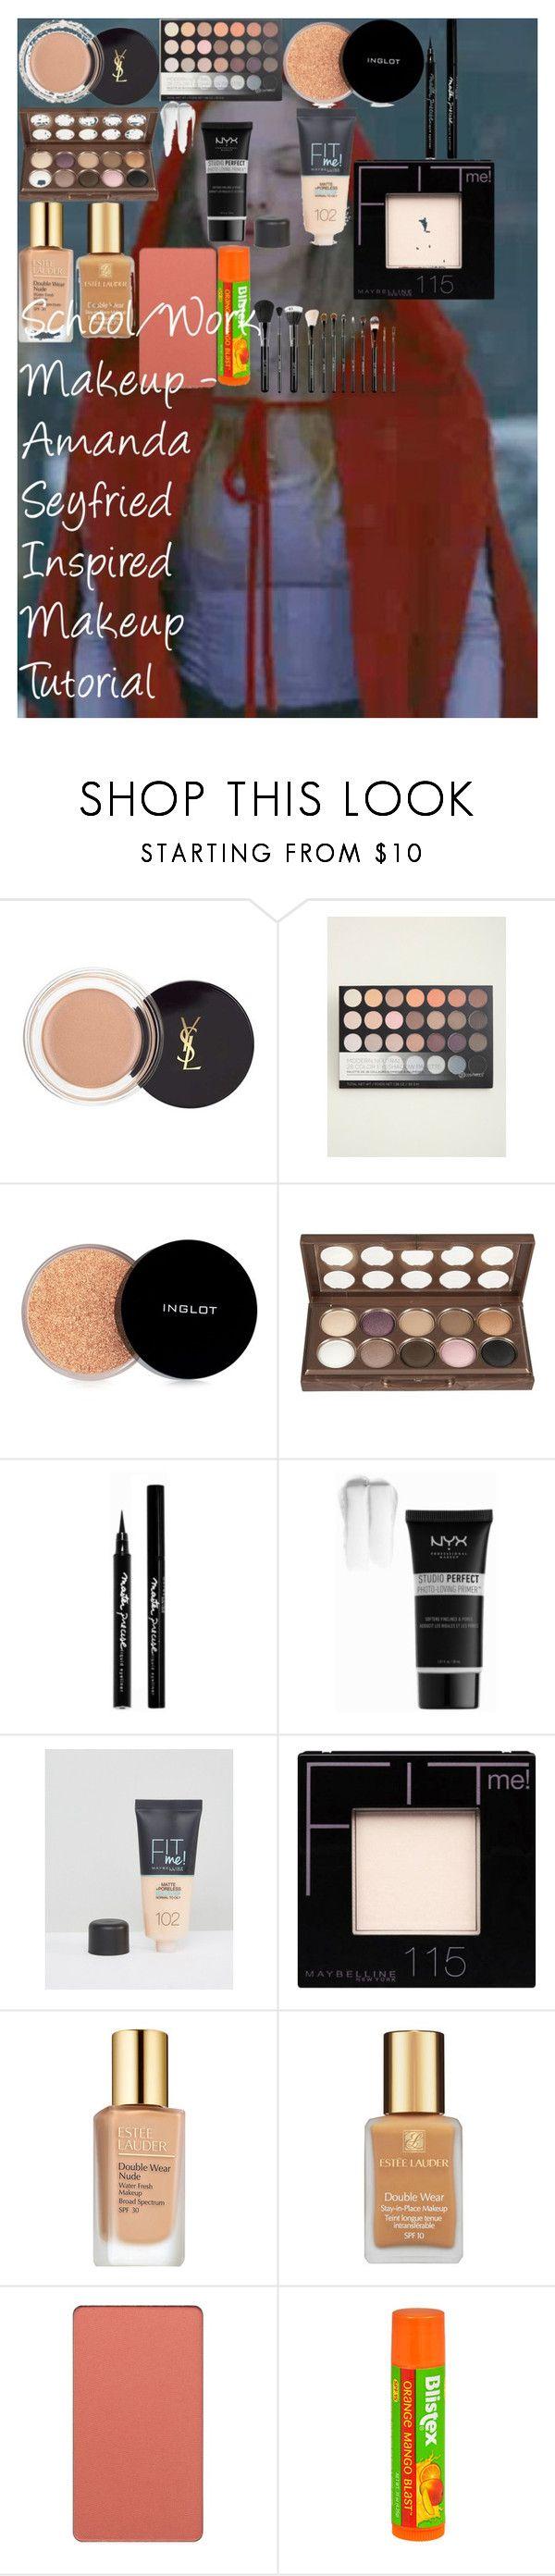 School/Work Makeup Amanda Seyfried Inspired Makeup